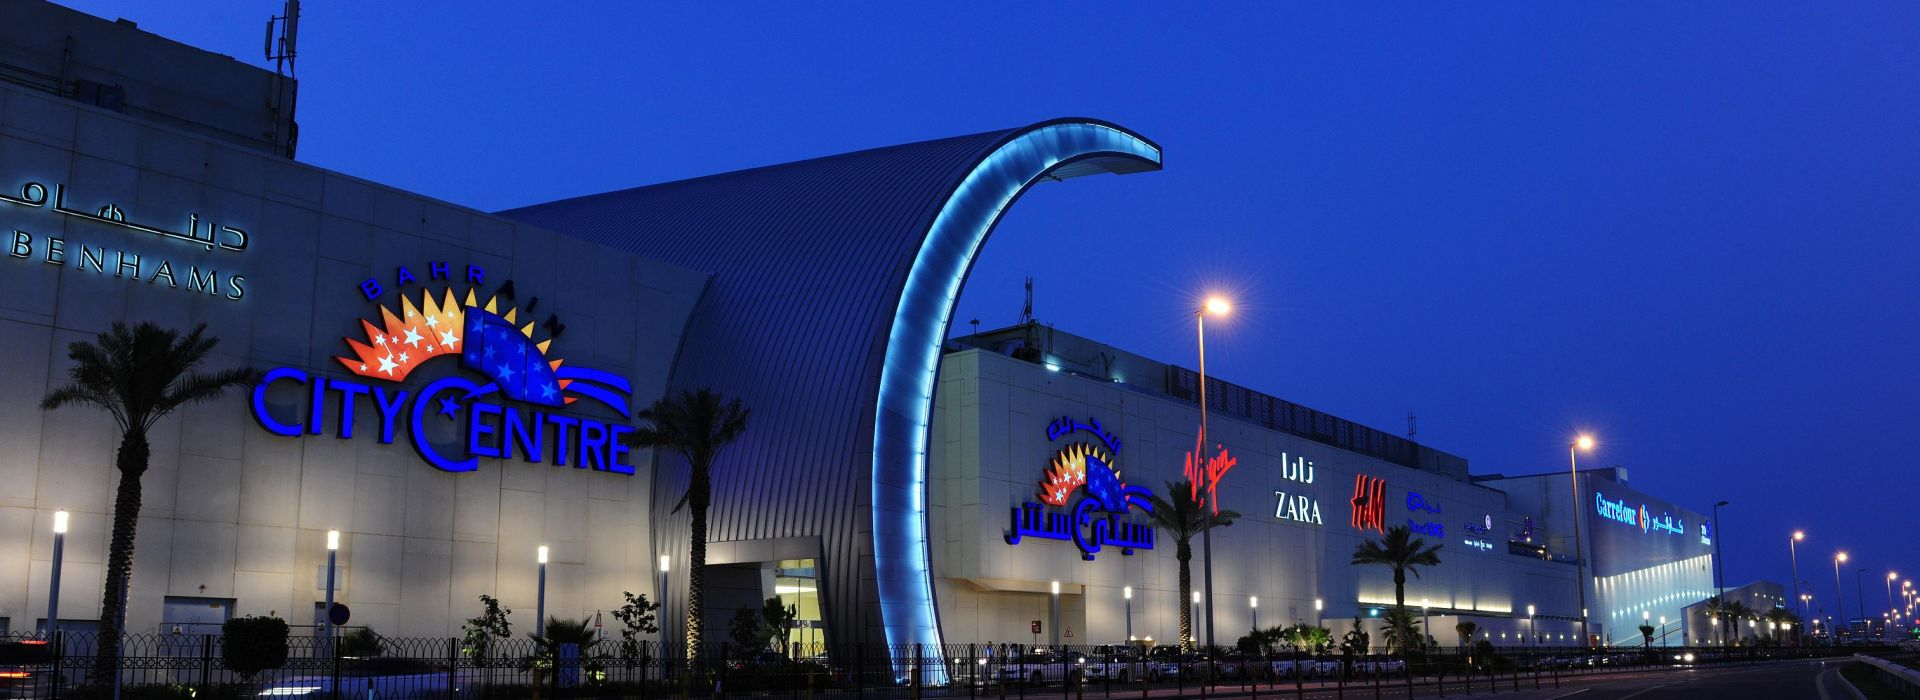 Bahrain City Centre Nearest Shopping Centre Wyndham Garden